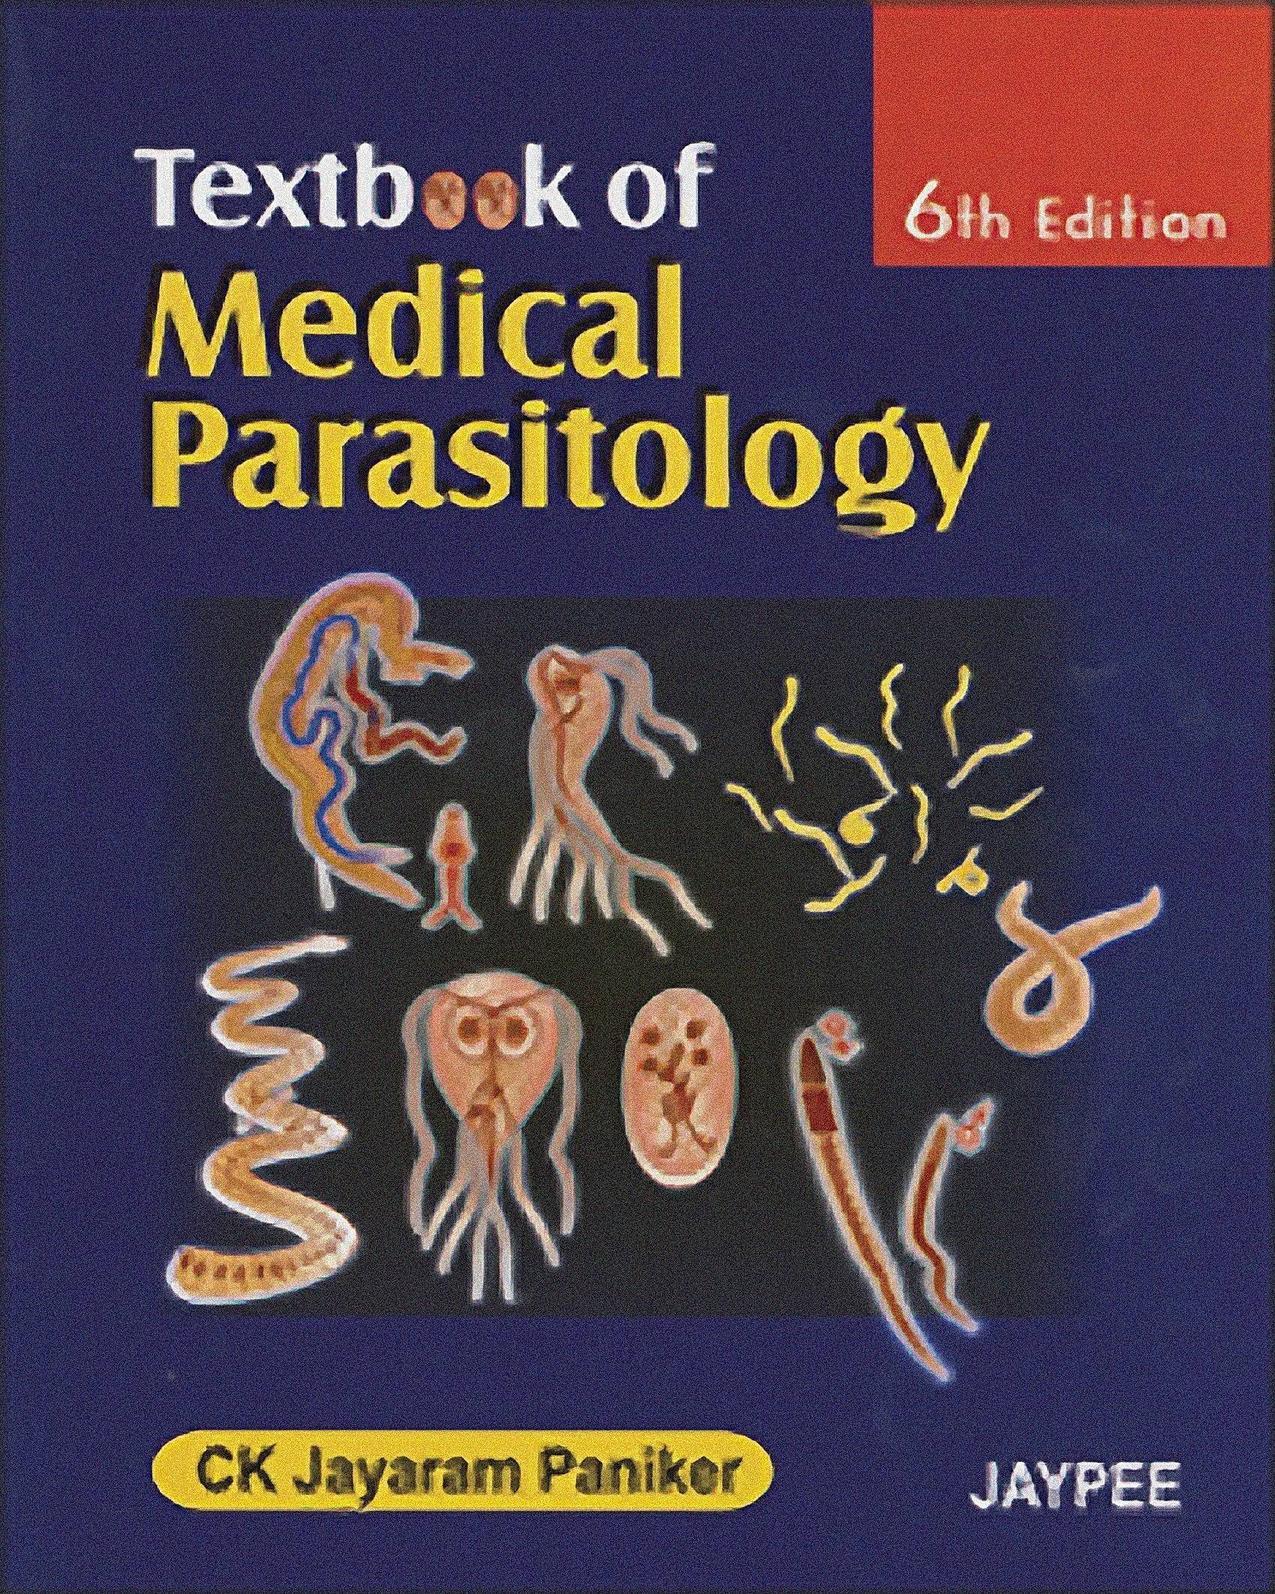 API Textbook of Medicine 9th Edition - Am-Medicine